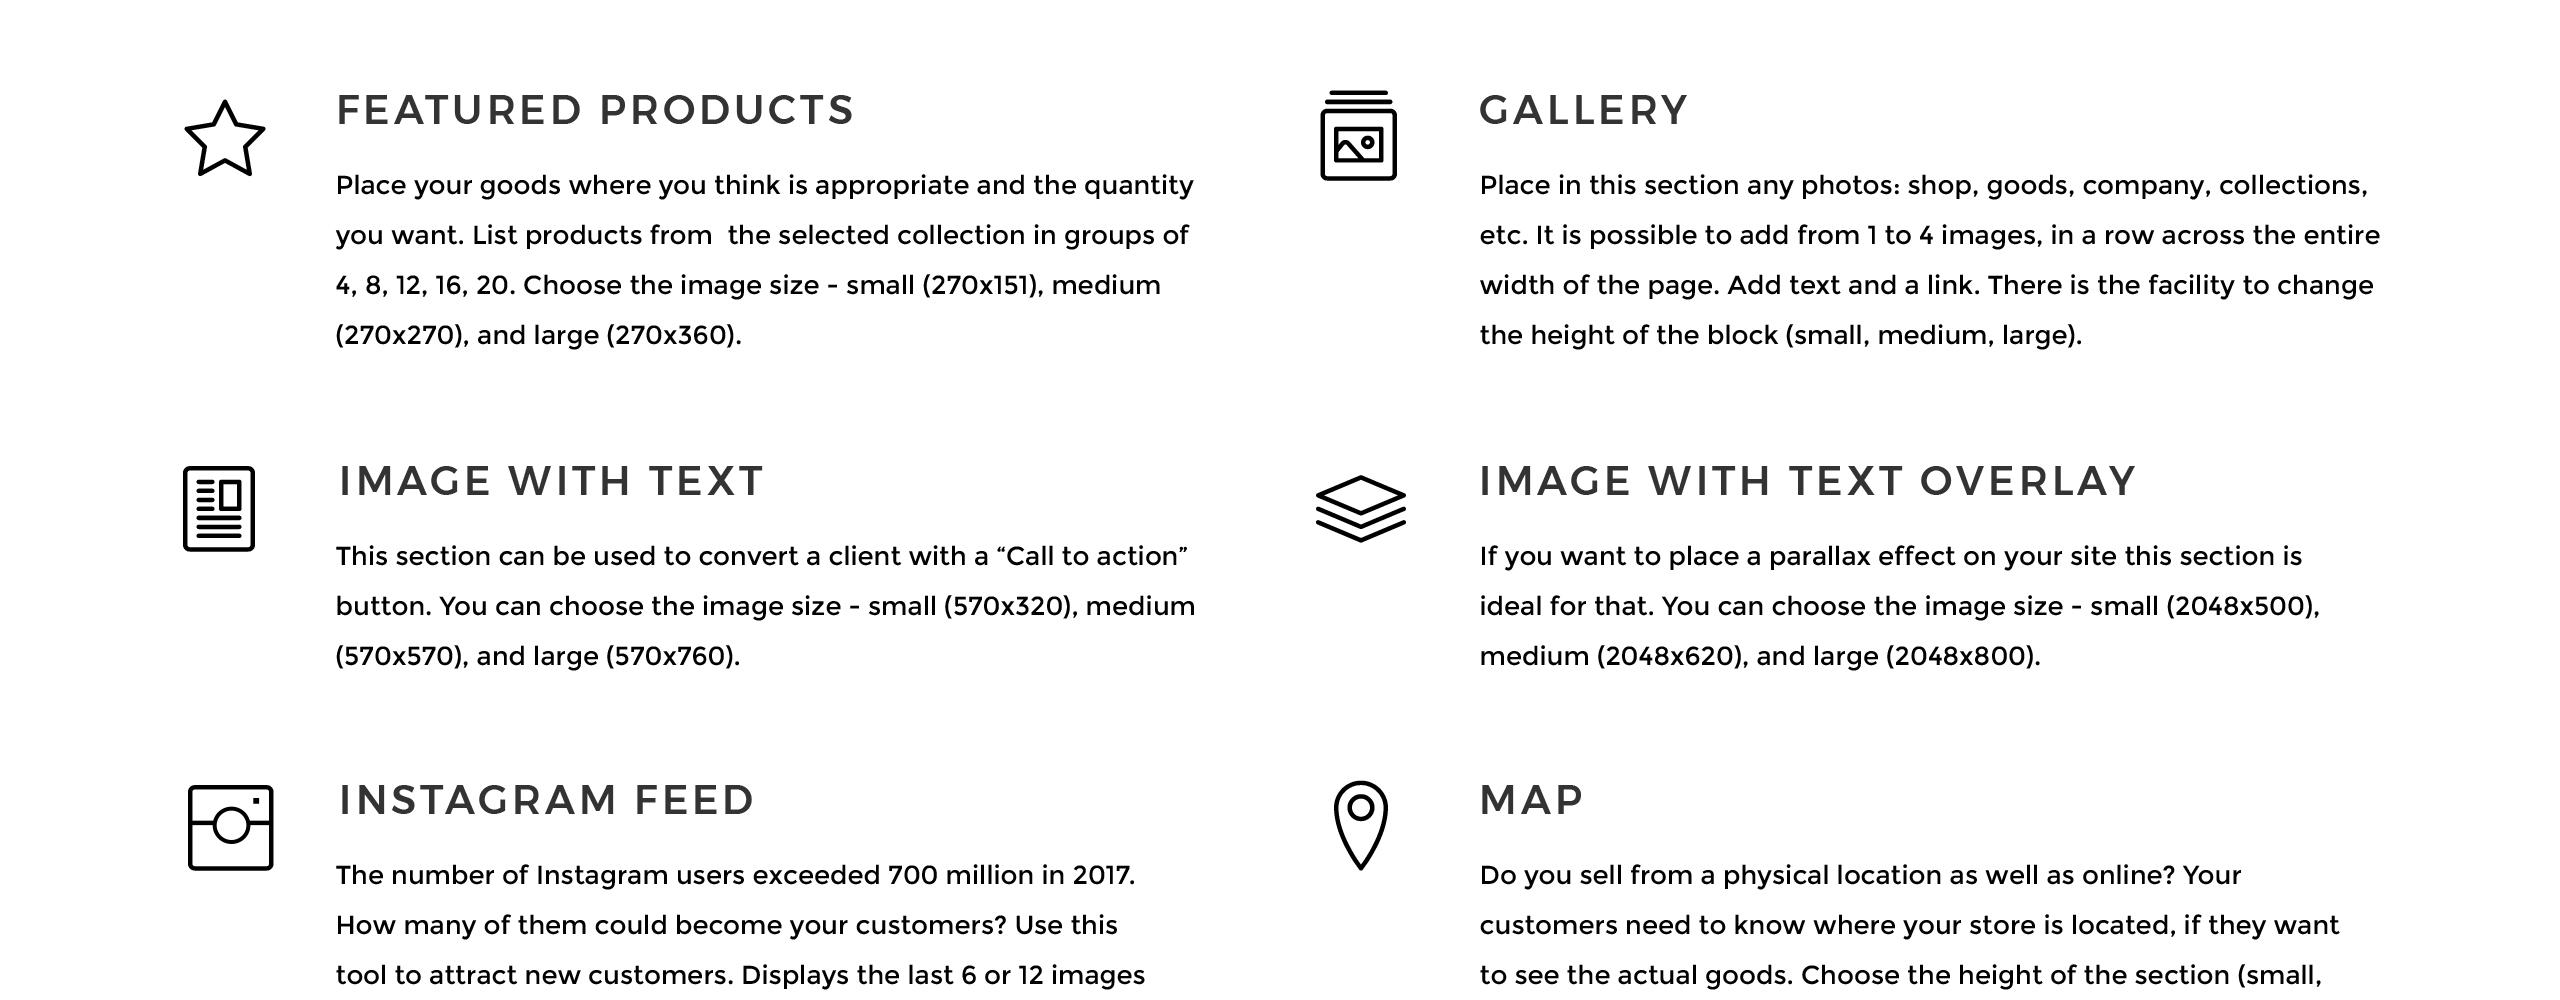 Website Design Template 70688 - gift